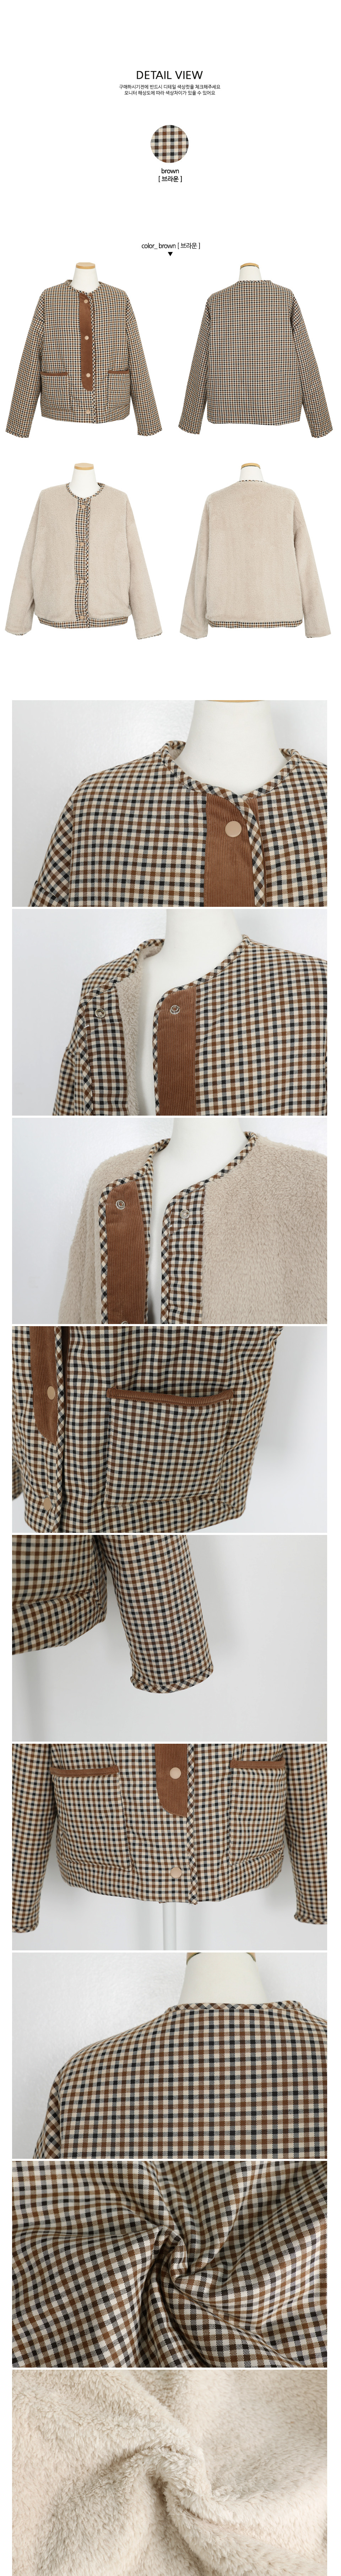 Cozy check reversible Jacket